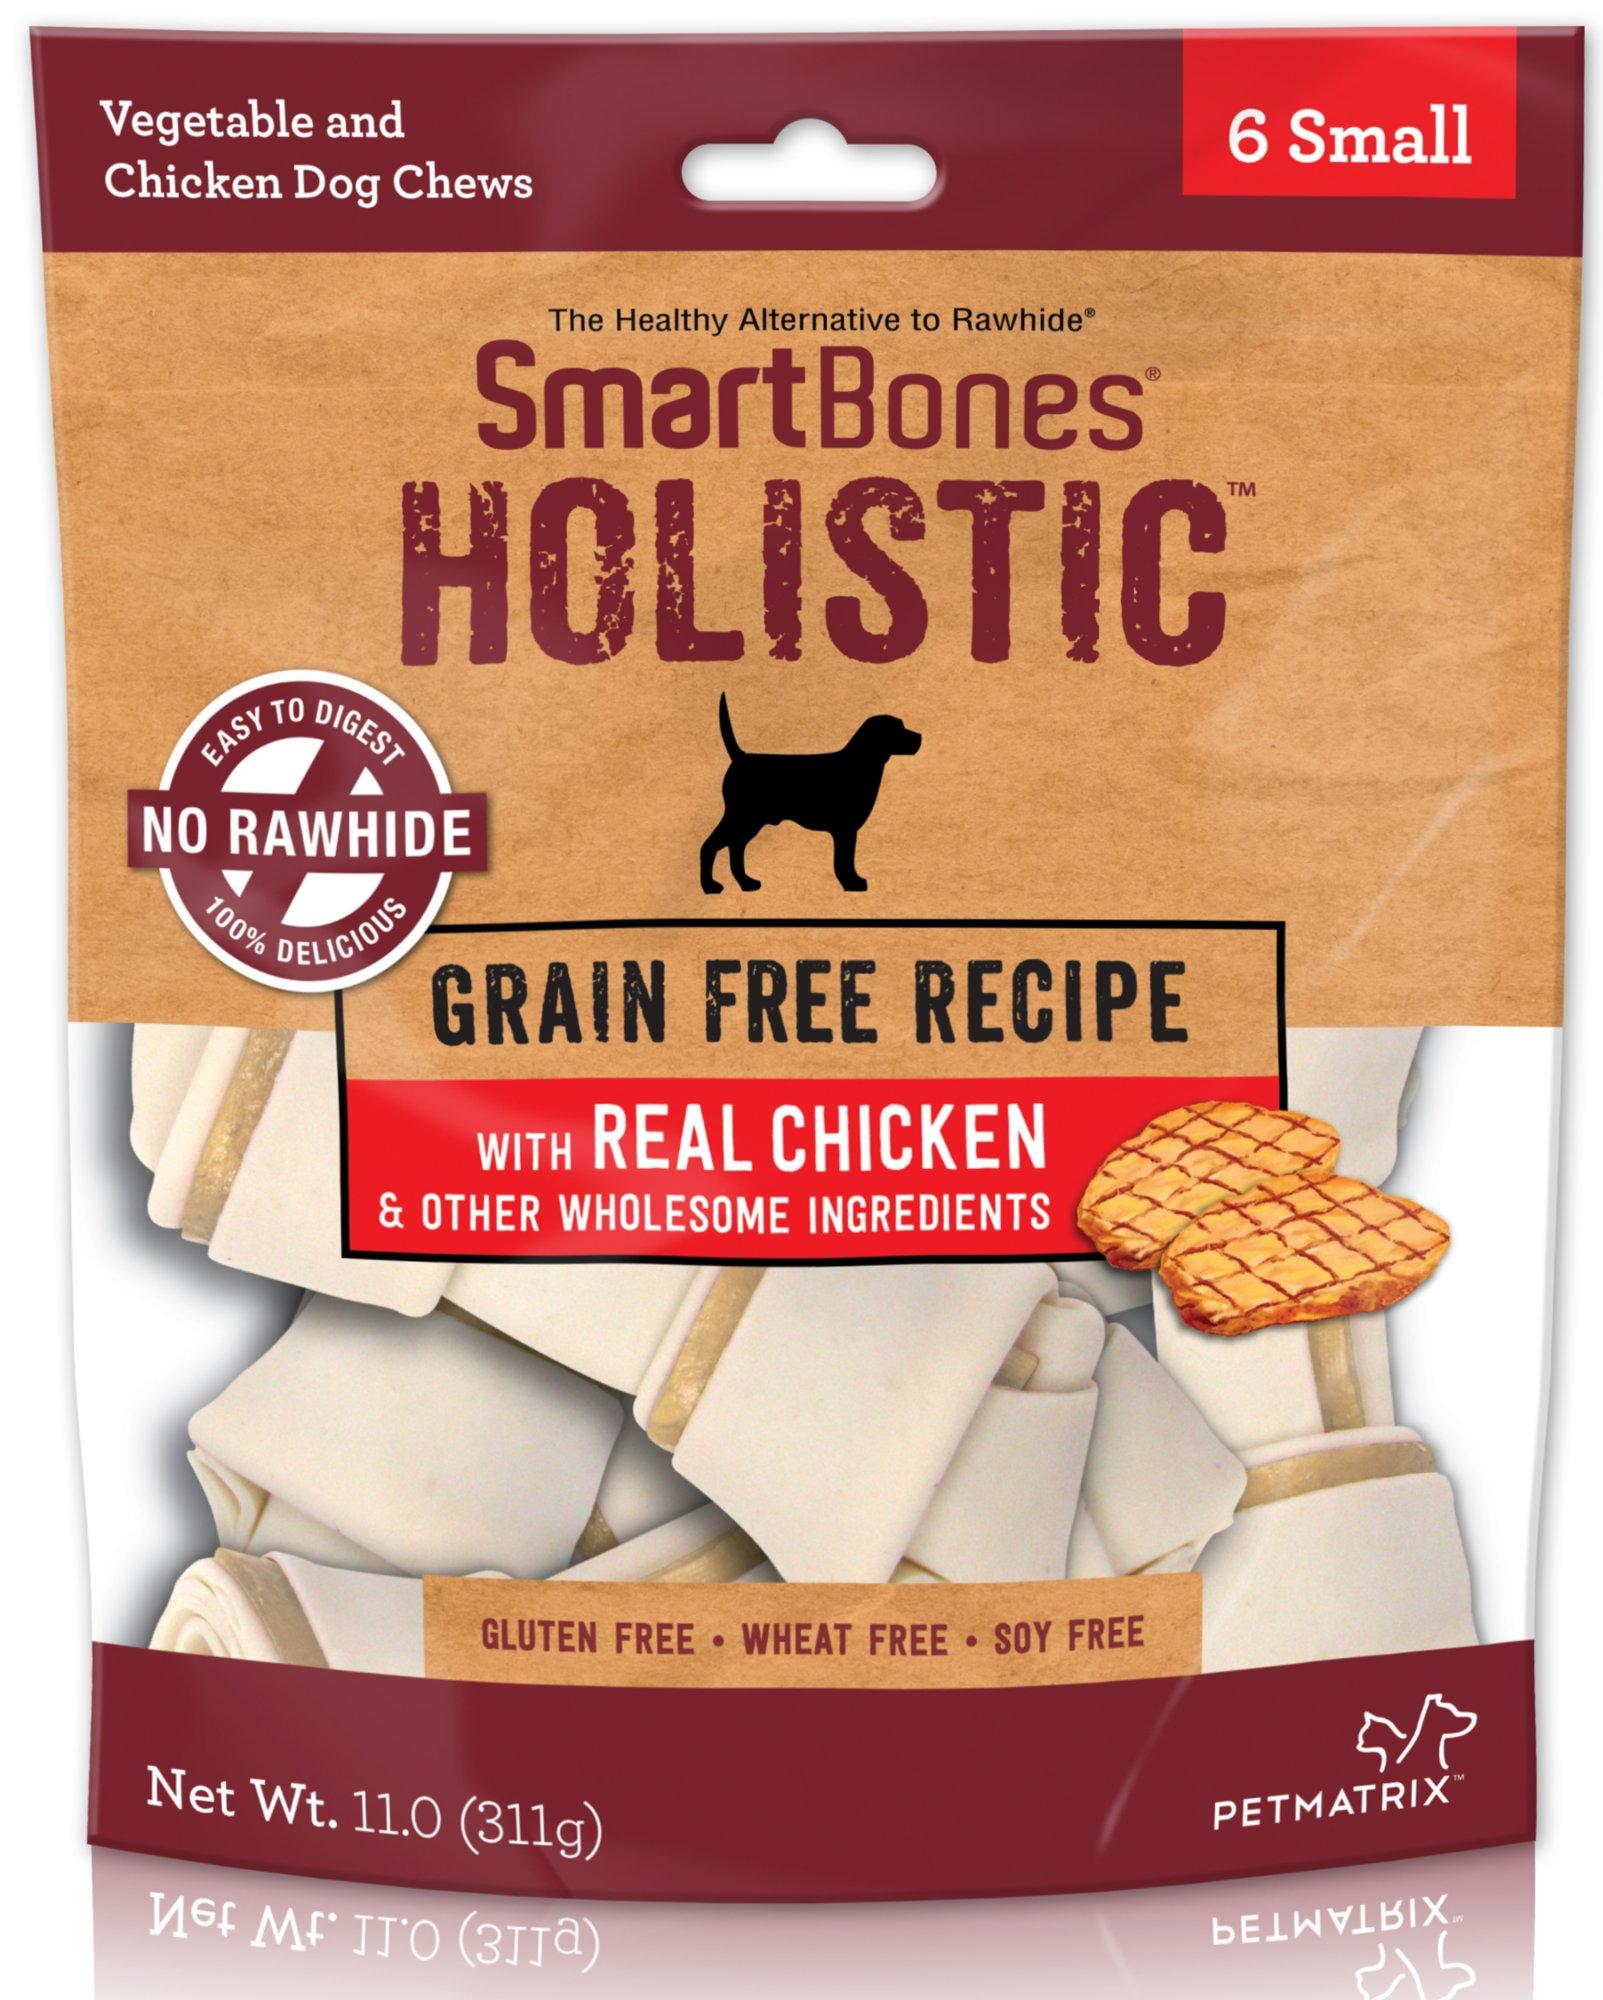 SmartBones Holistic Small Dog Chews